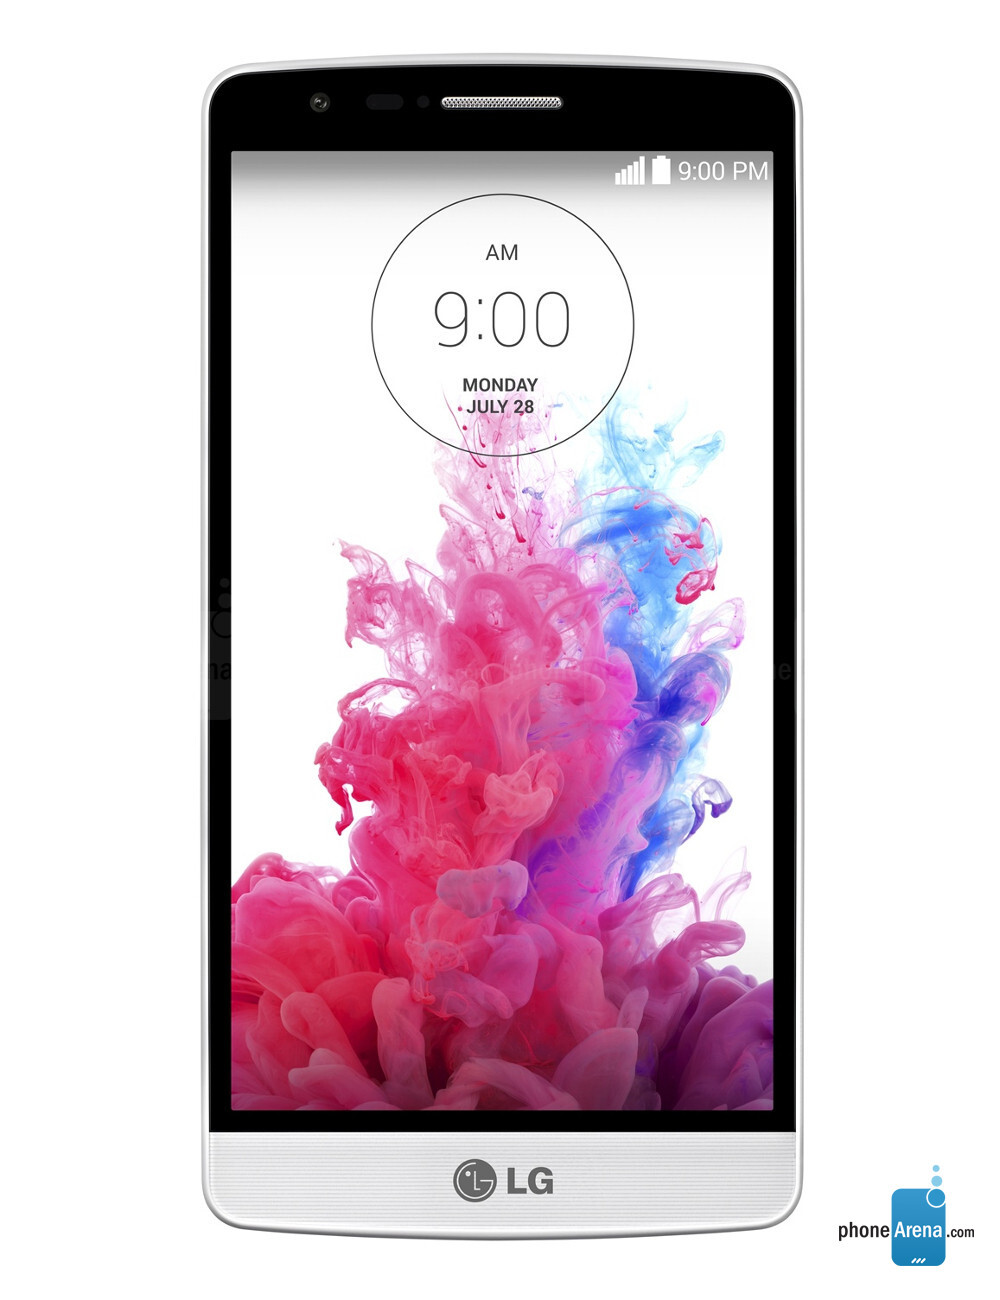 http://i-cdn.phonearena.com/images/phones/47942-xlarge/LG-G3-s-0.jpg